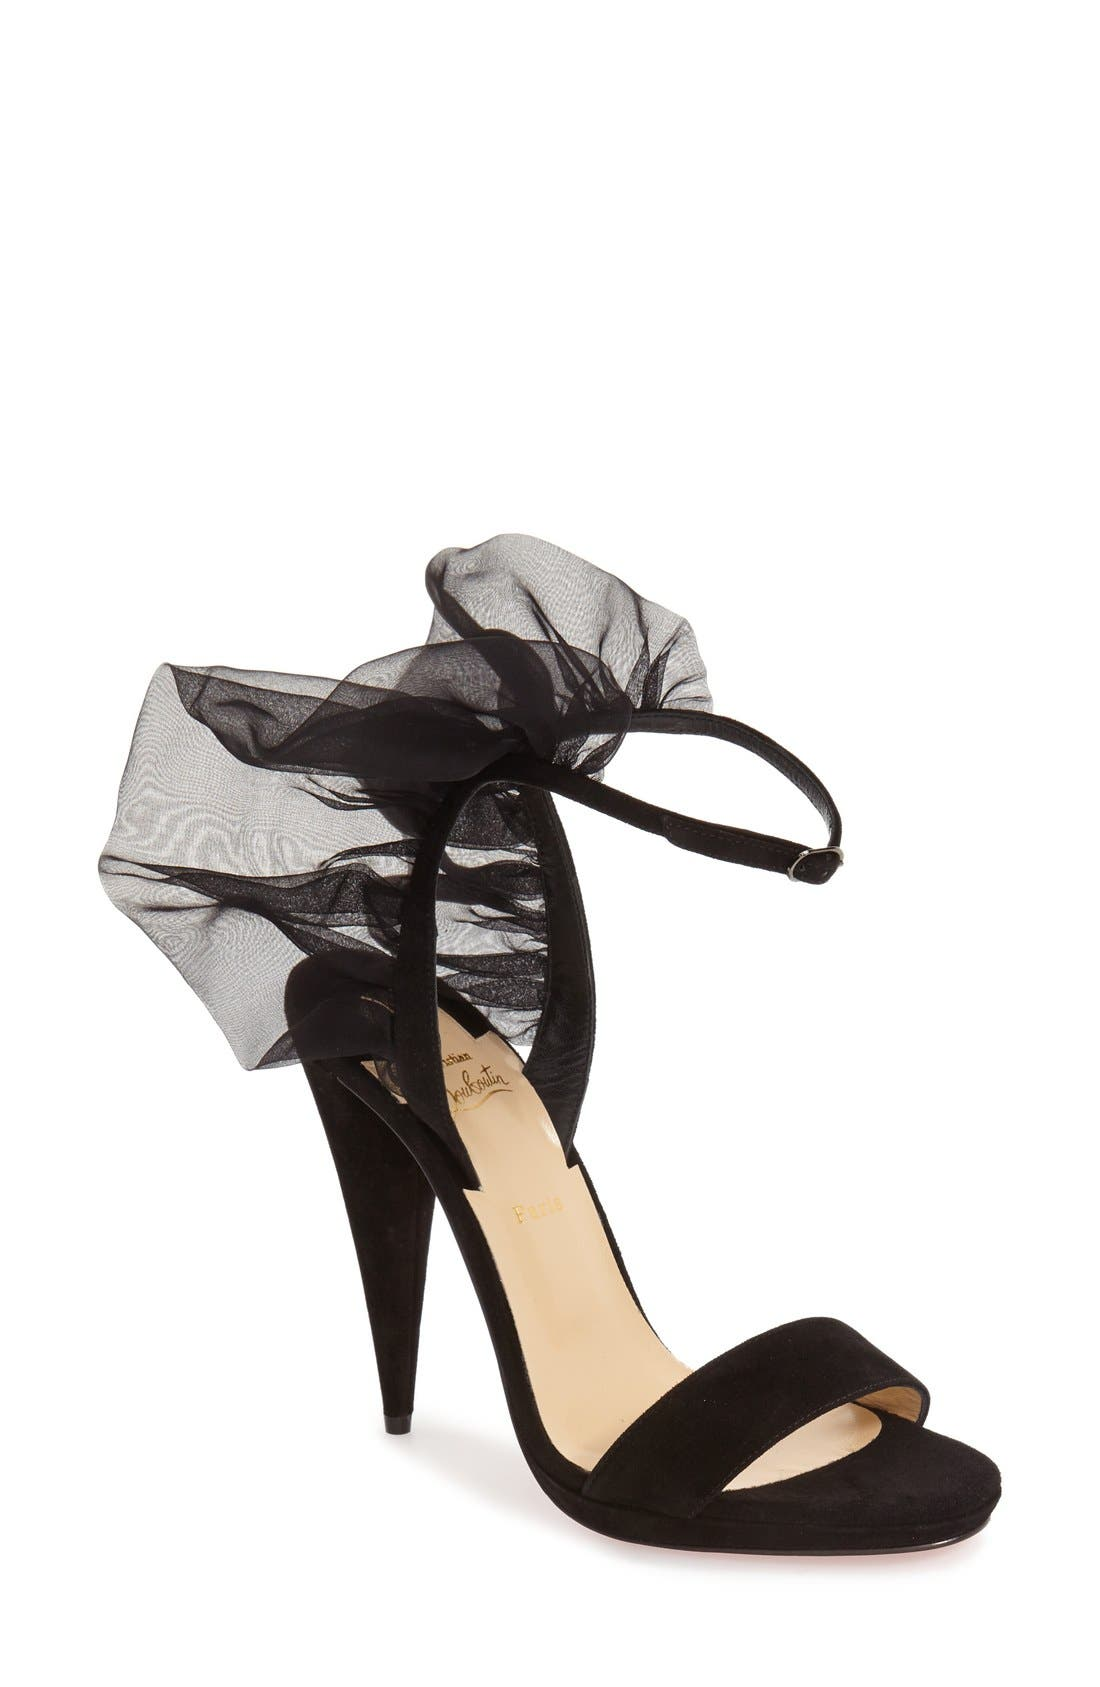 Alternate Image 1 Selected - Christian Louboutin 'Jacqueline' Sandal